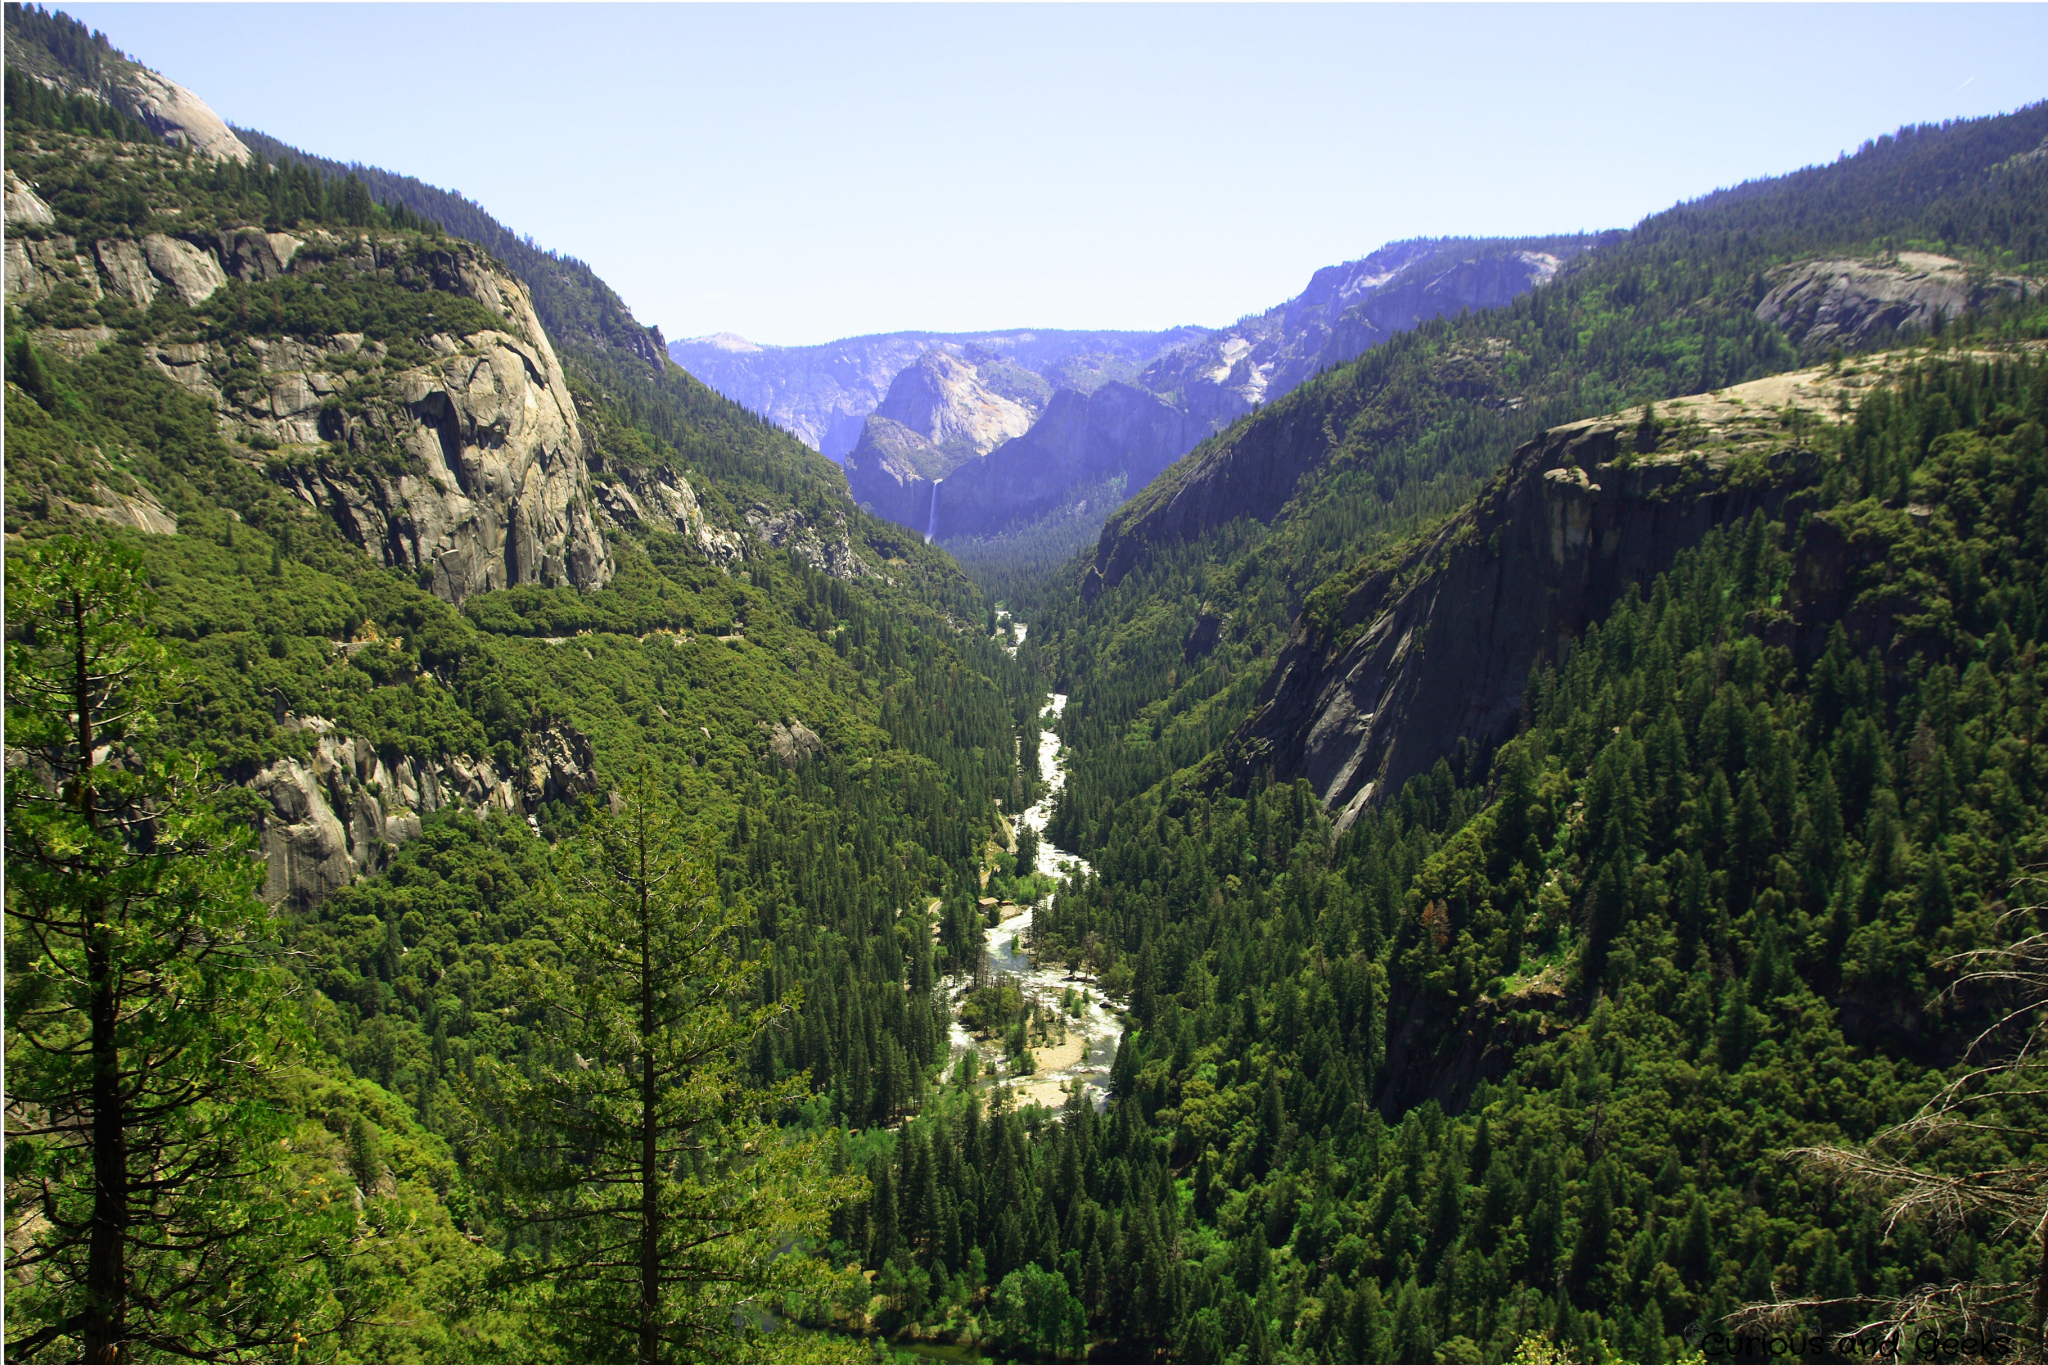 West Coast USA Road Trip Yosemite - Our three-week West Coast USA Road Trip